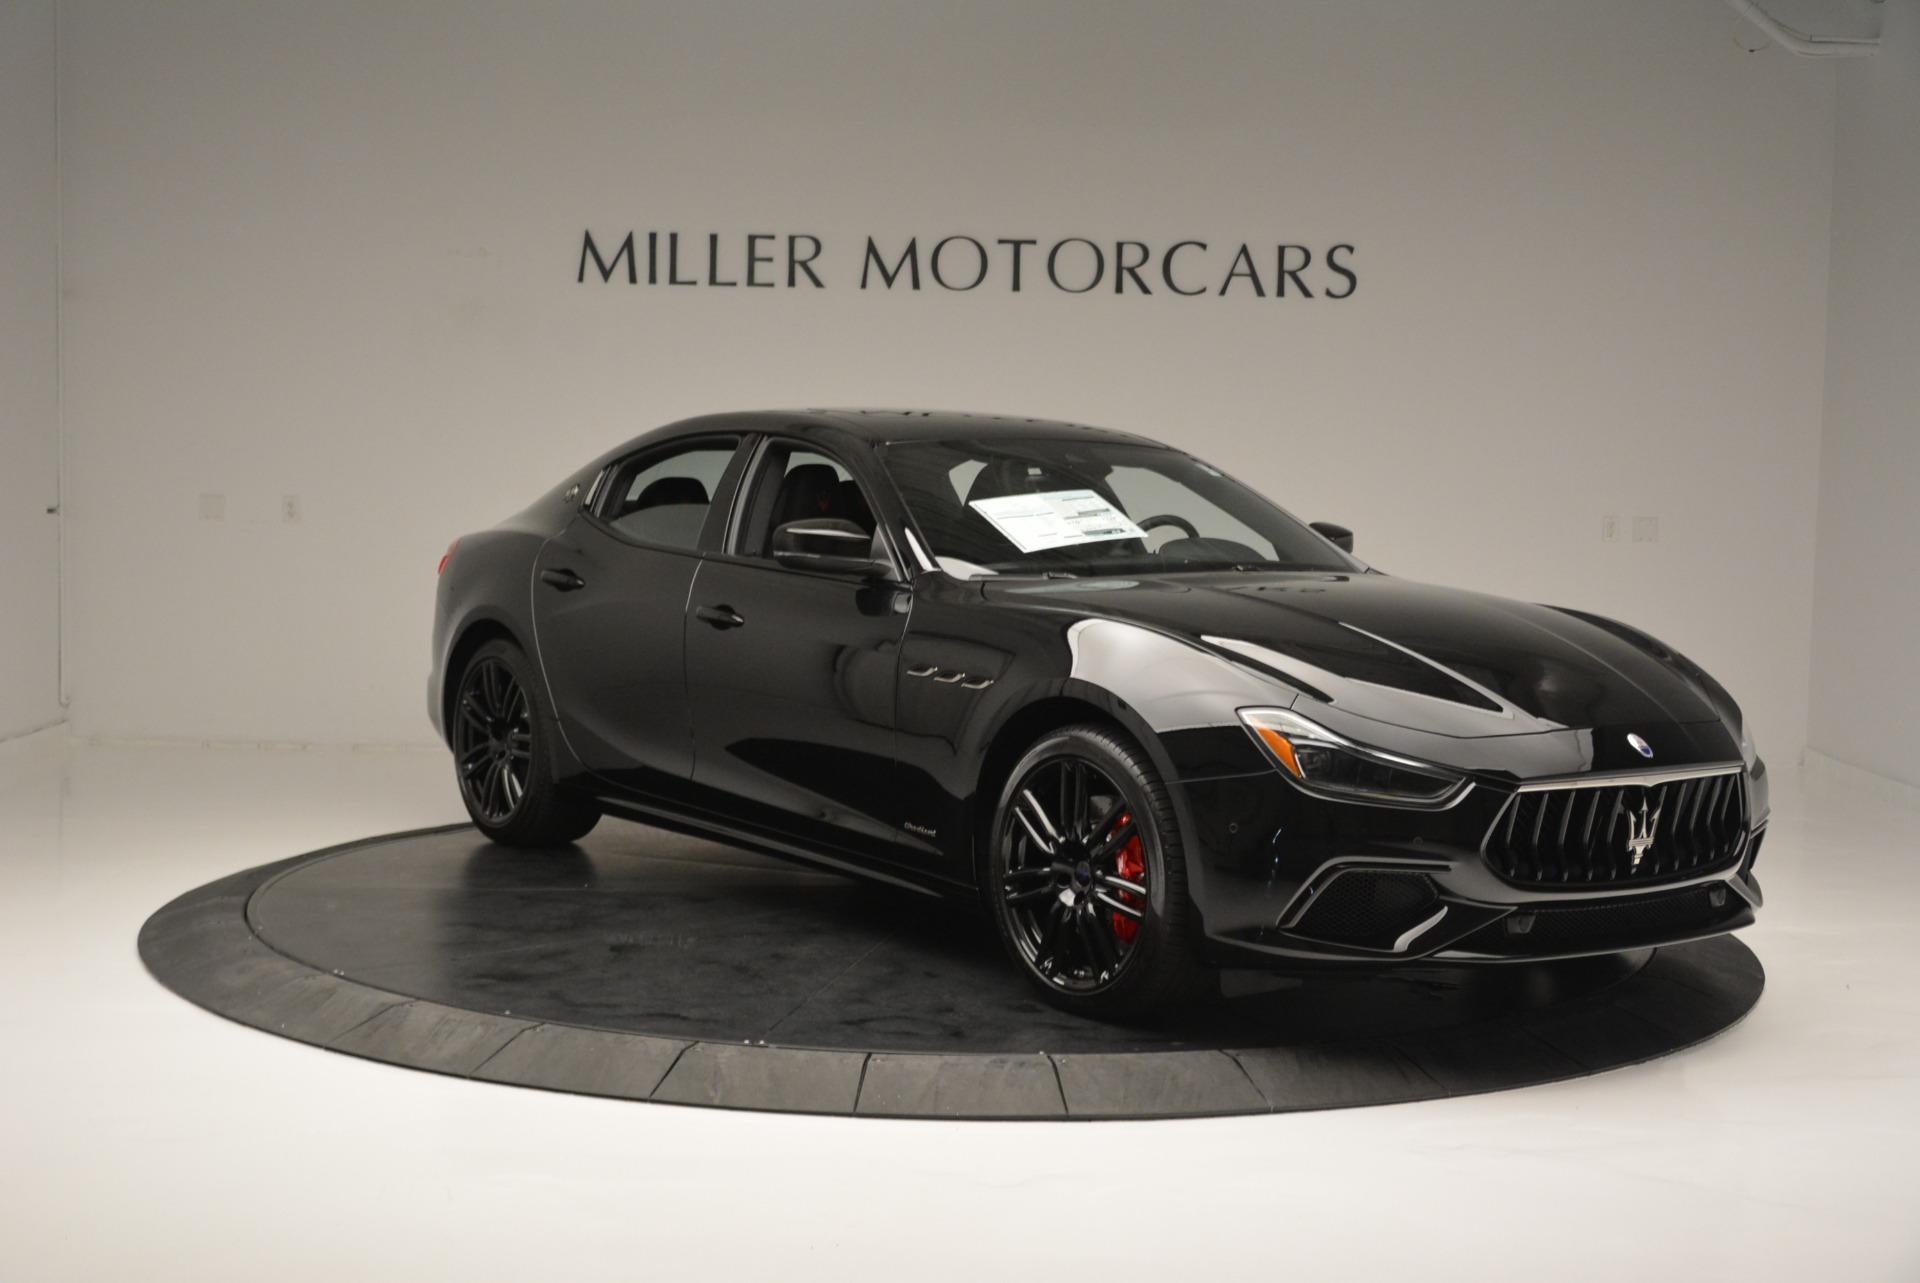 New 2018 Maserati Ghibli SQ4 GranSport Nerissimo For Sale In Westport, CT 2372_p11